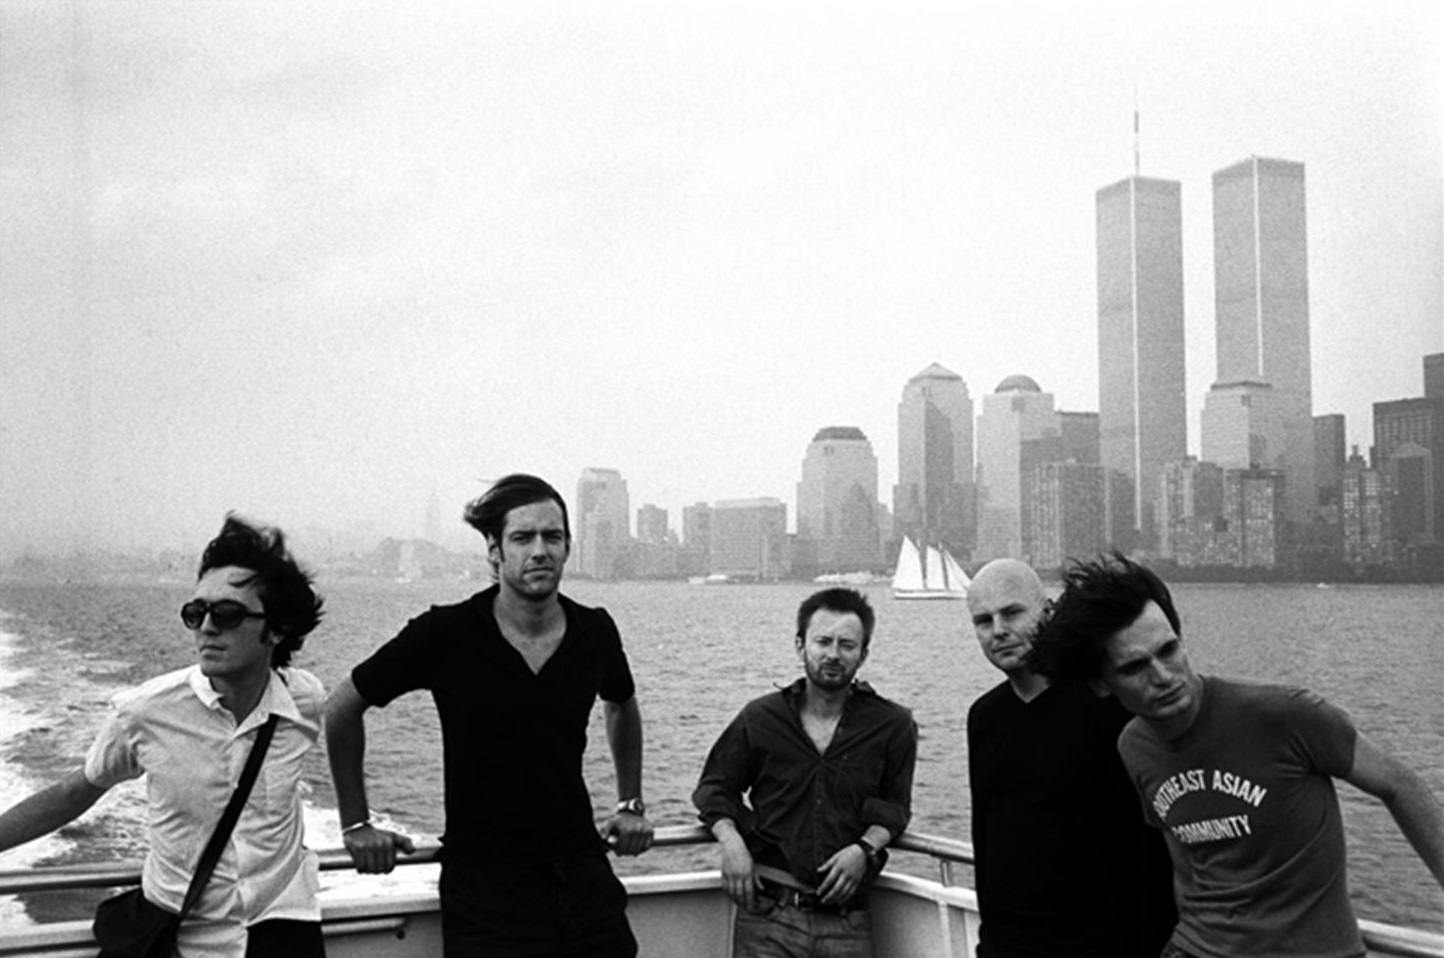 http://bayanbox.ir/view/921855531100199534/DC-WTC-Radiohead.jpg